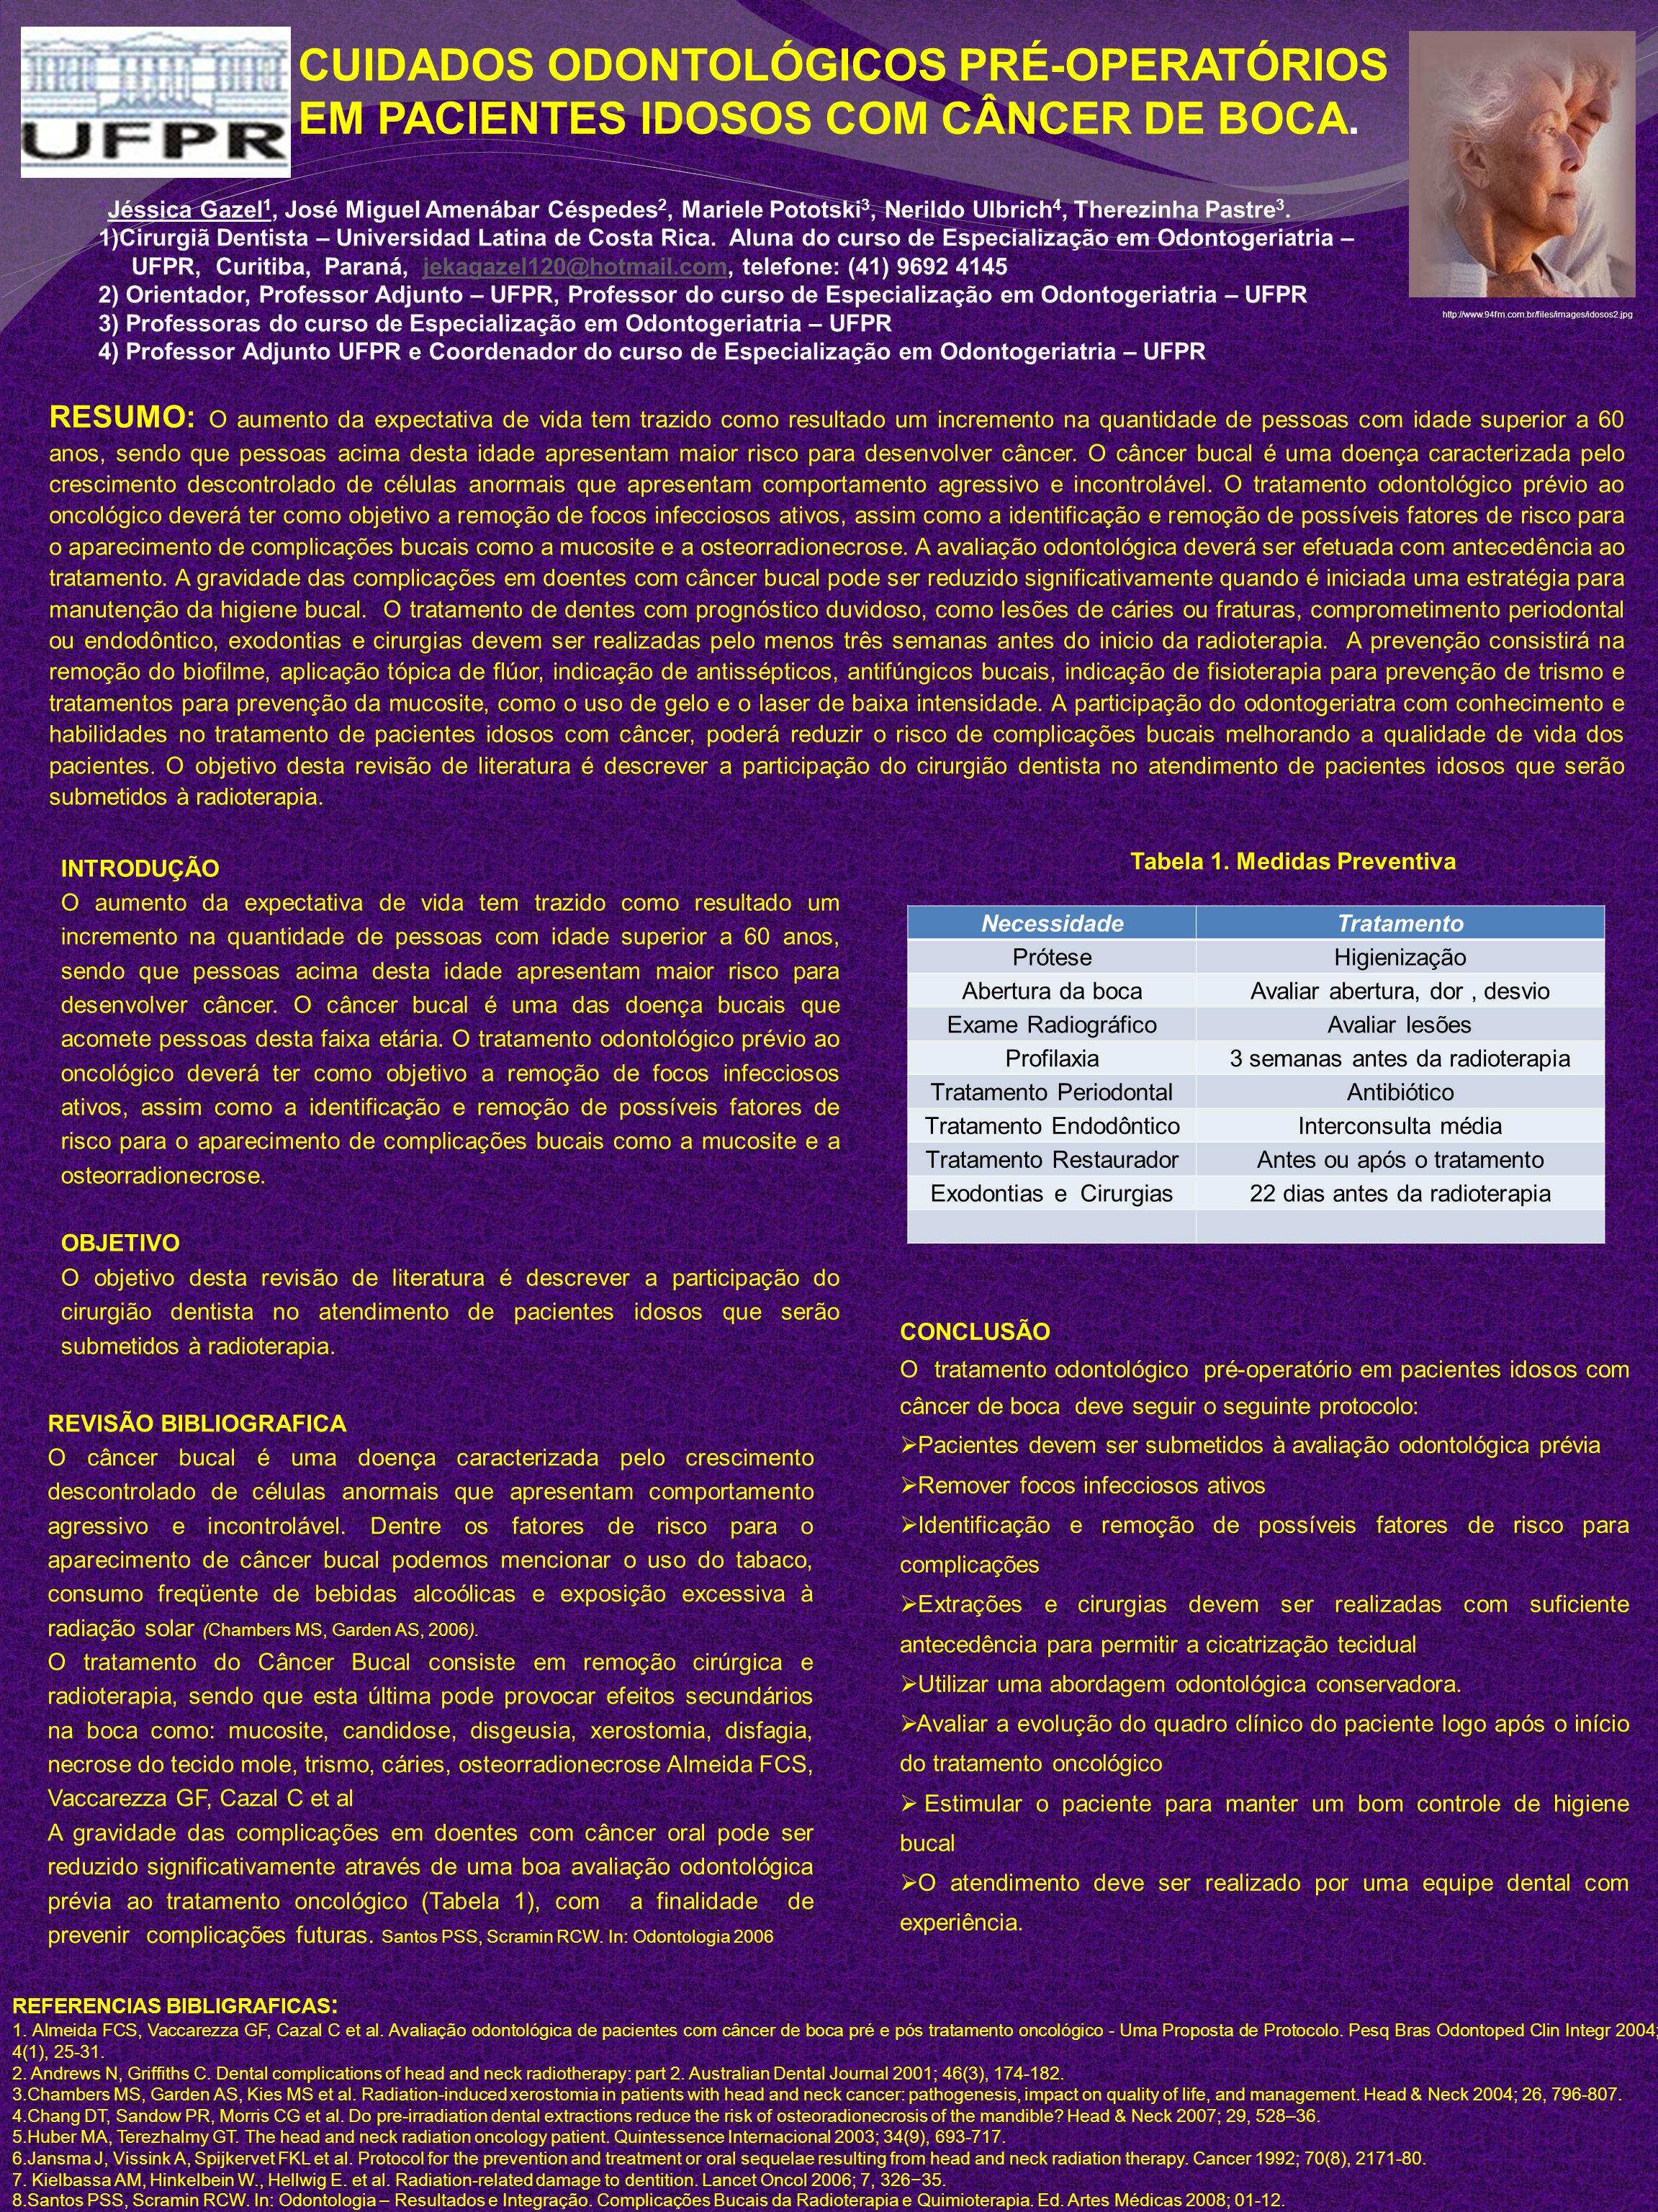 Tabela 1. Medidas Preventiva